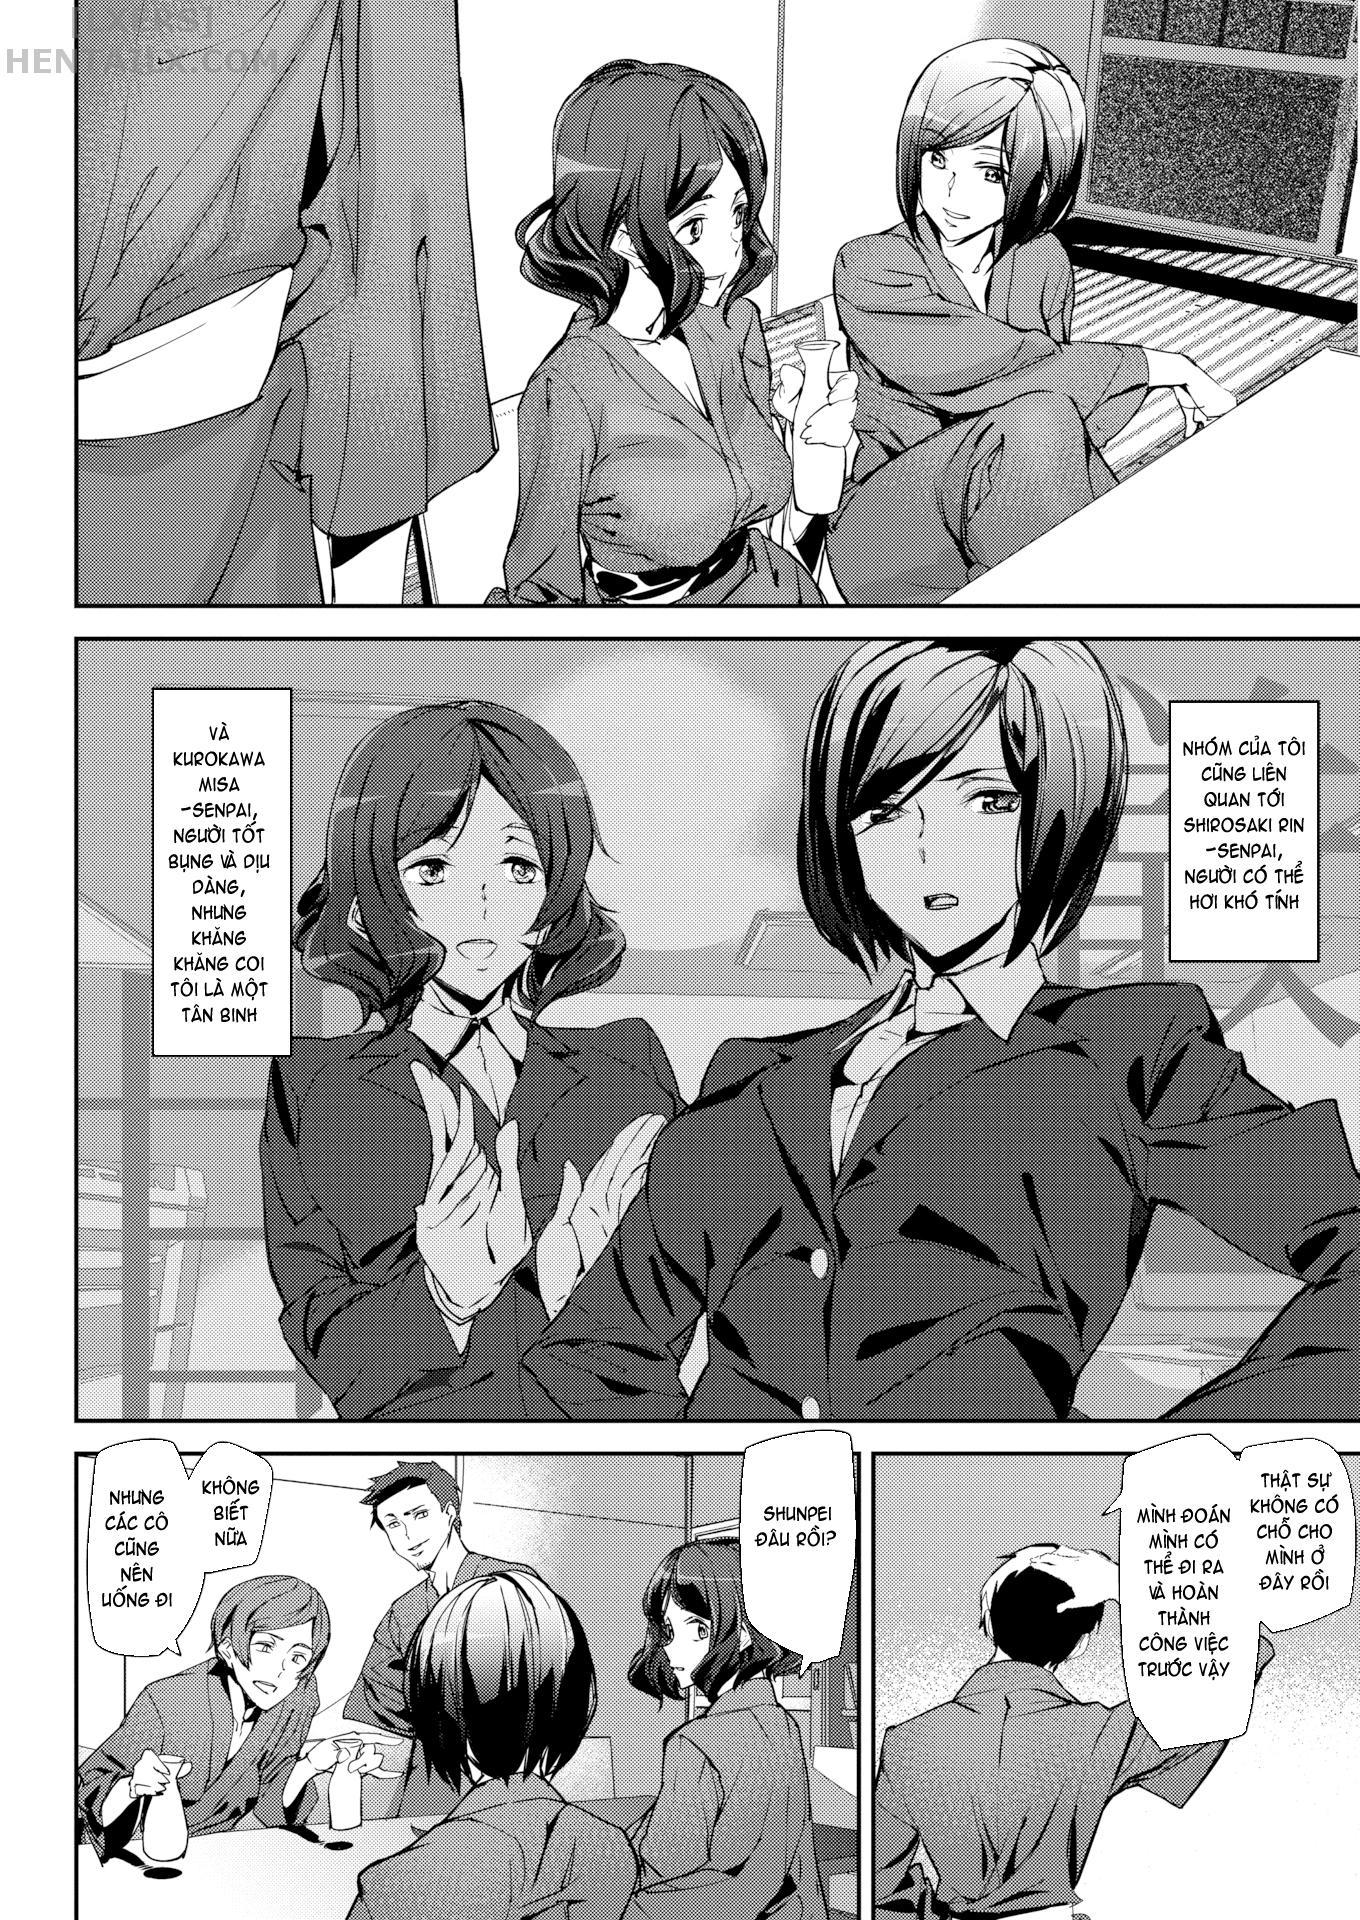 004 Hot Trip  - hentaicube.net - Truyện tranh hentai online